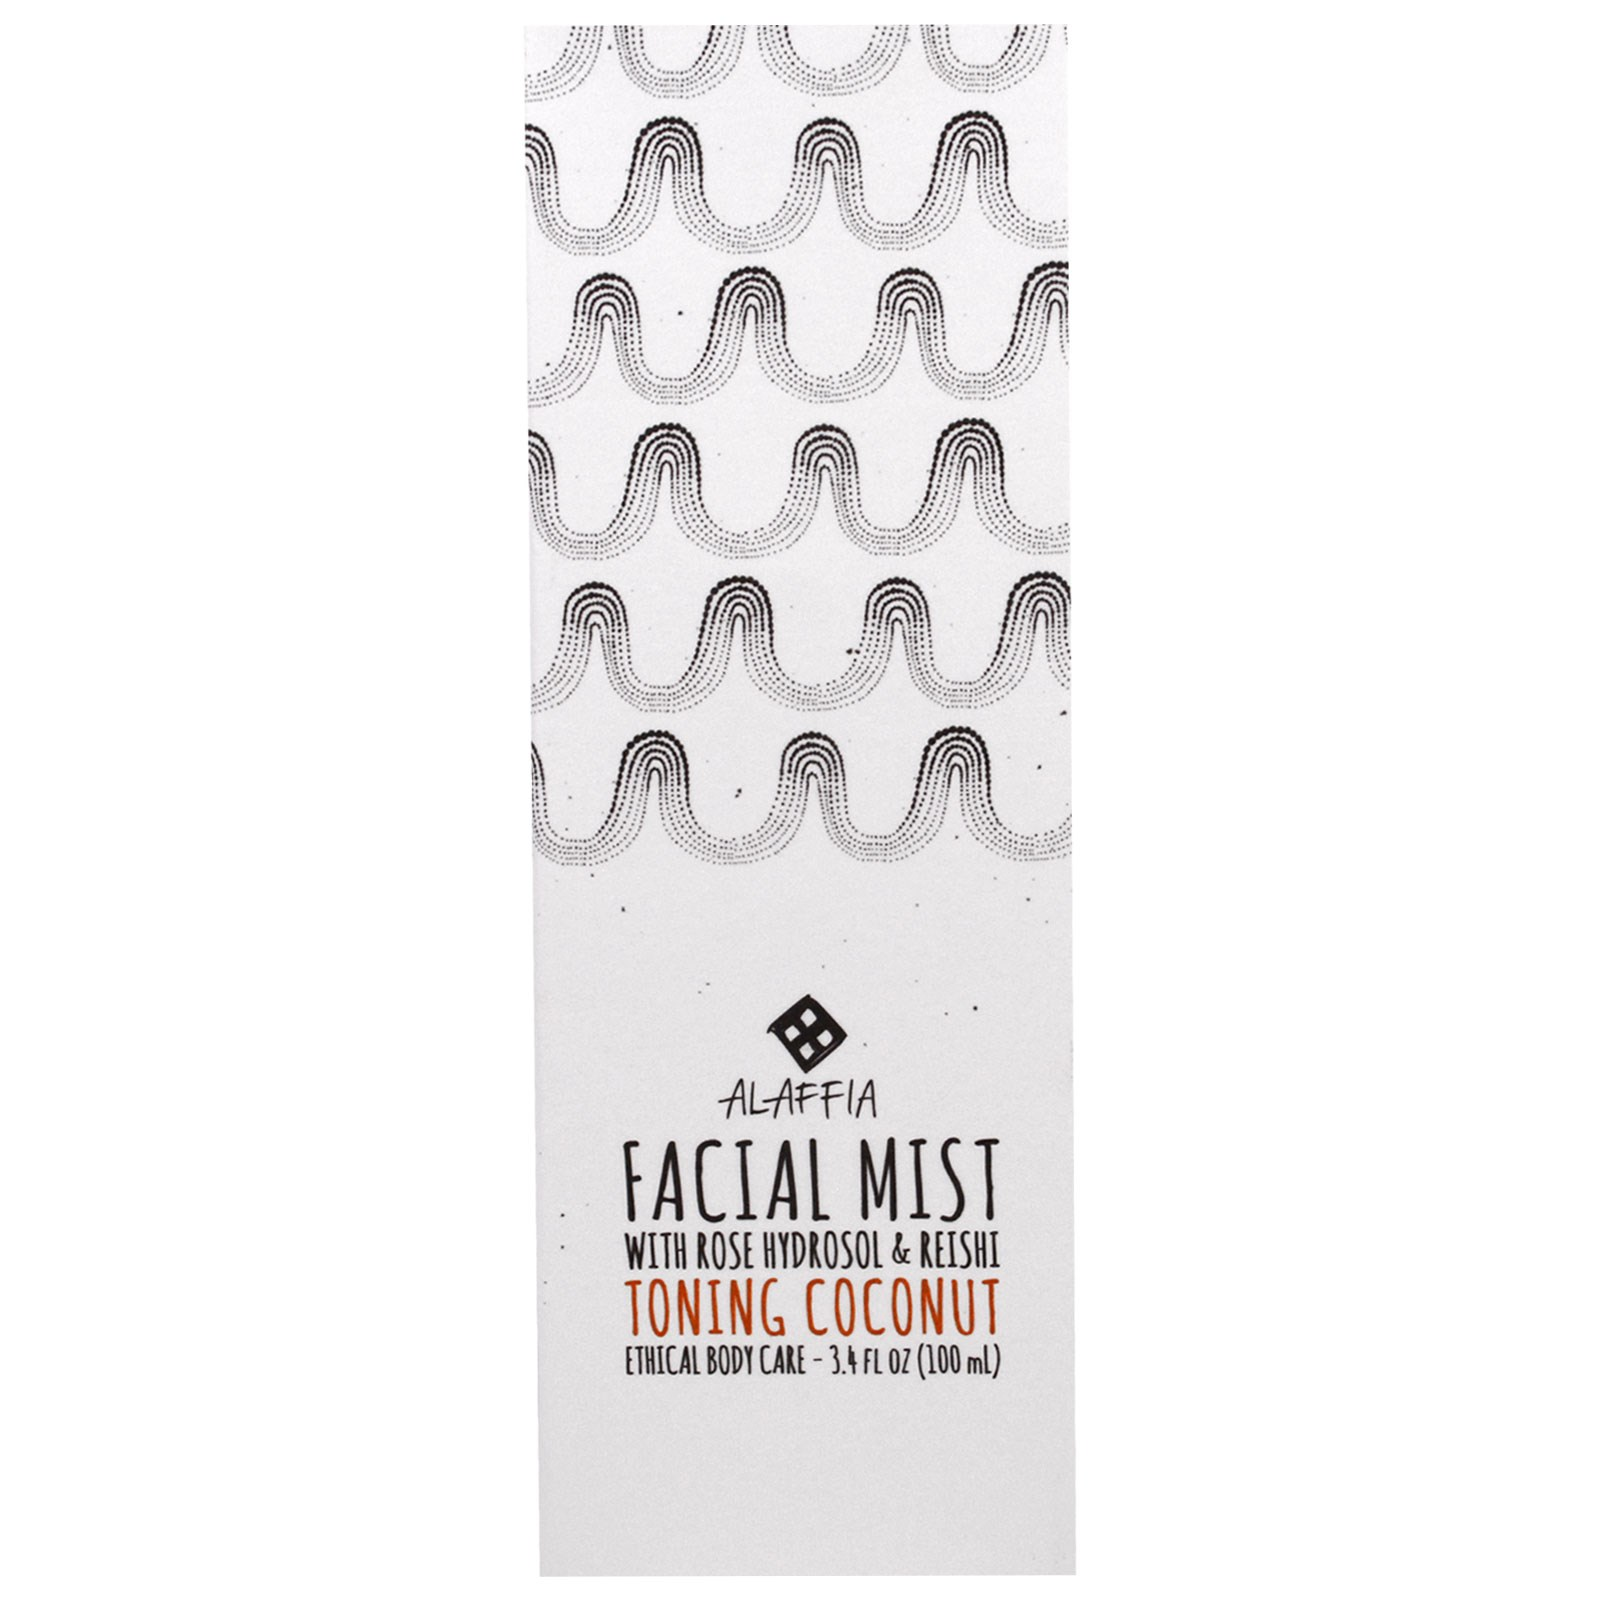 Alaffia, Facial Mist, Toning Coconut, 3.4 fl oz(pack of 4) 6 Pk Benzoyl Peroxide 5 % Generic for Oxy Balance Acne Medication Gel 1.5oz Ea